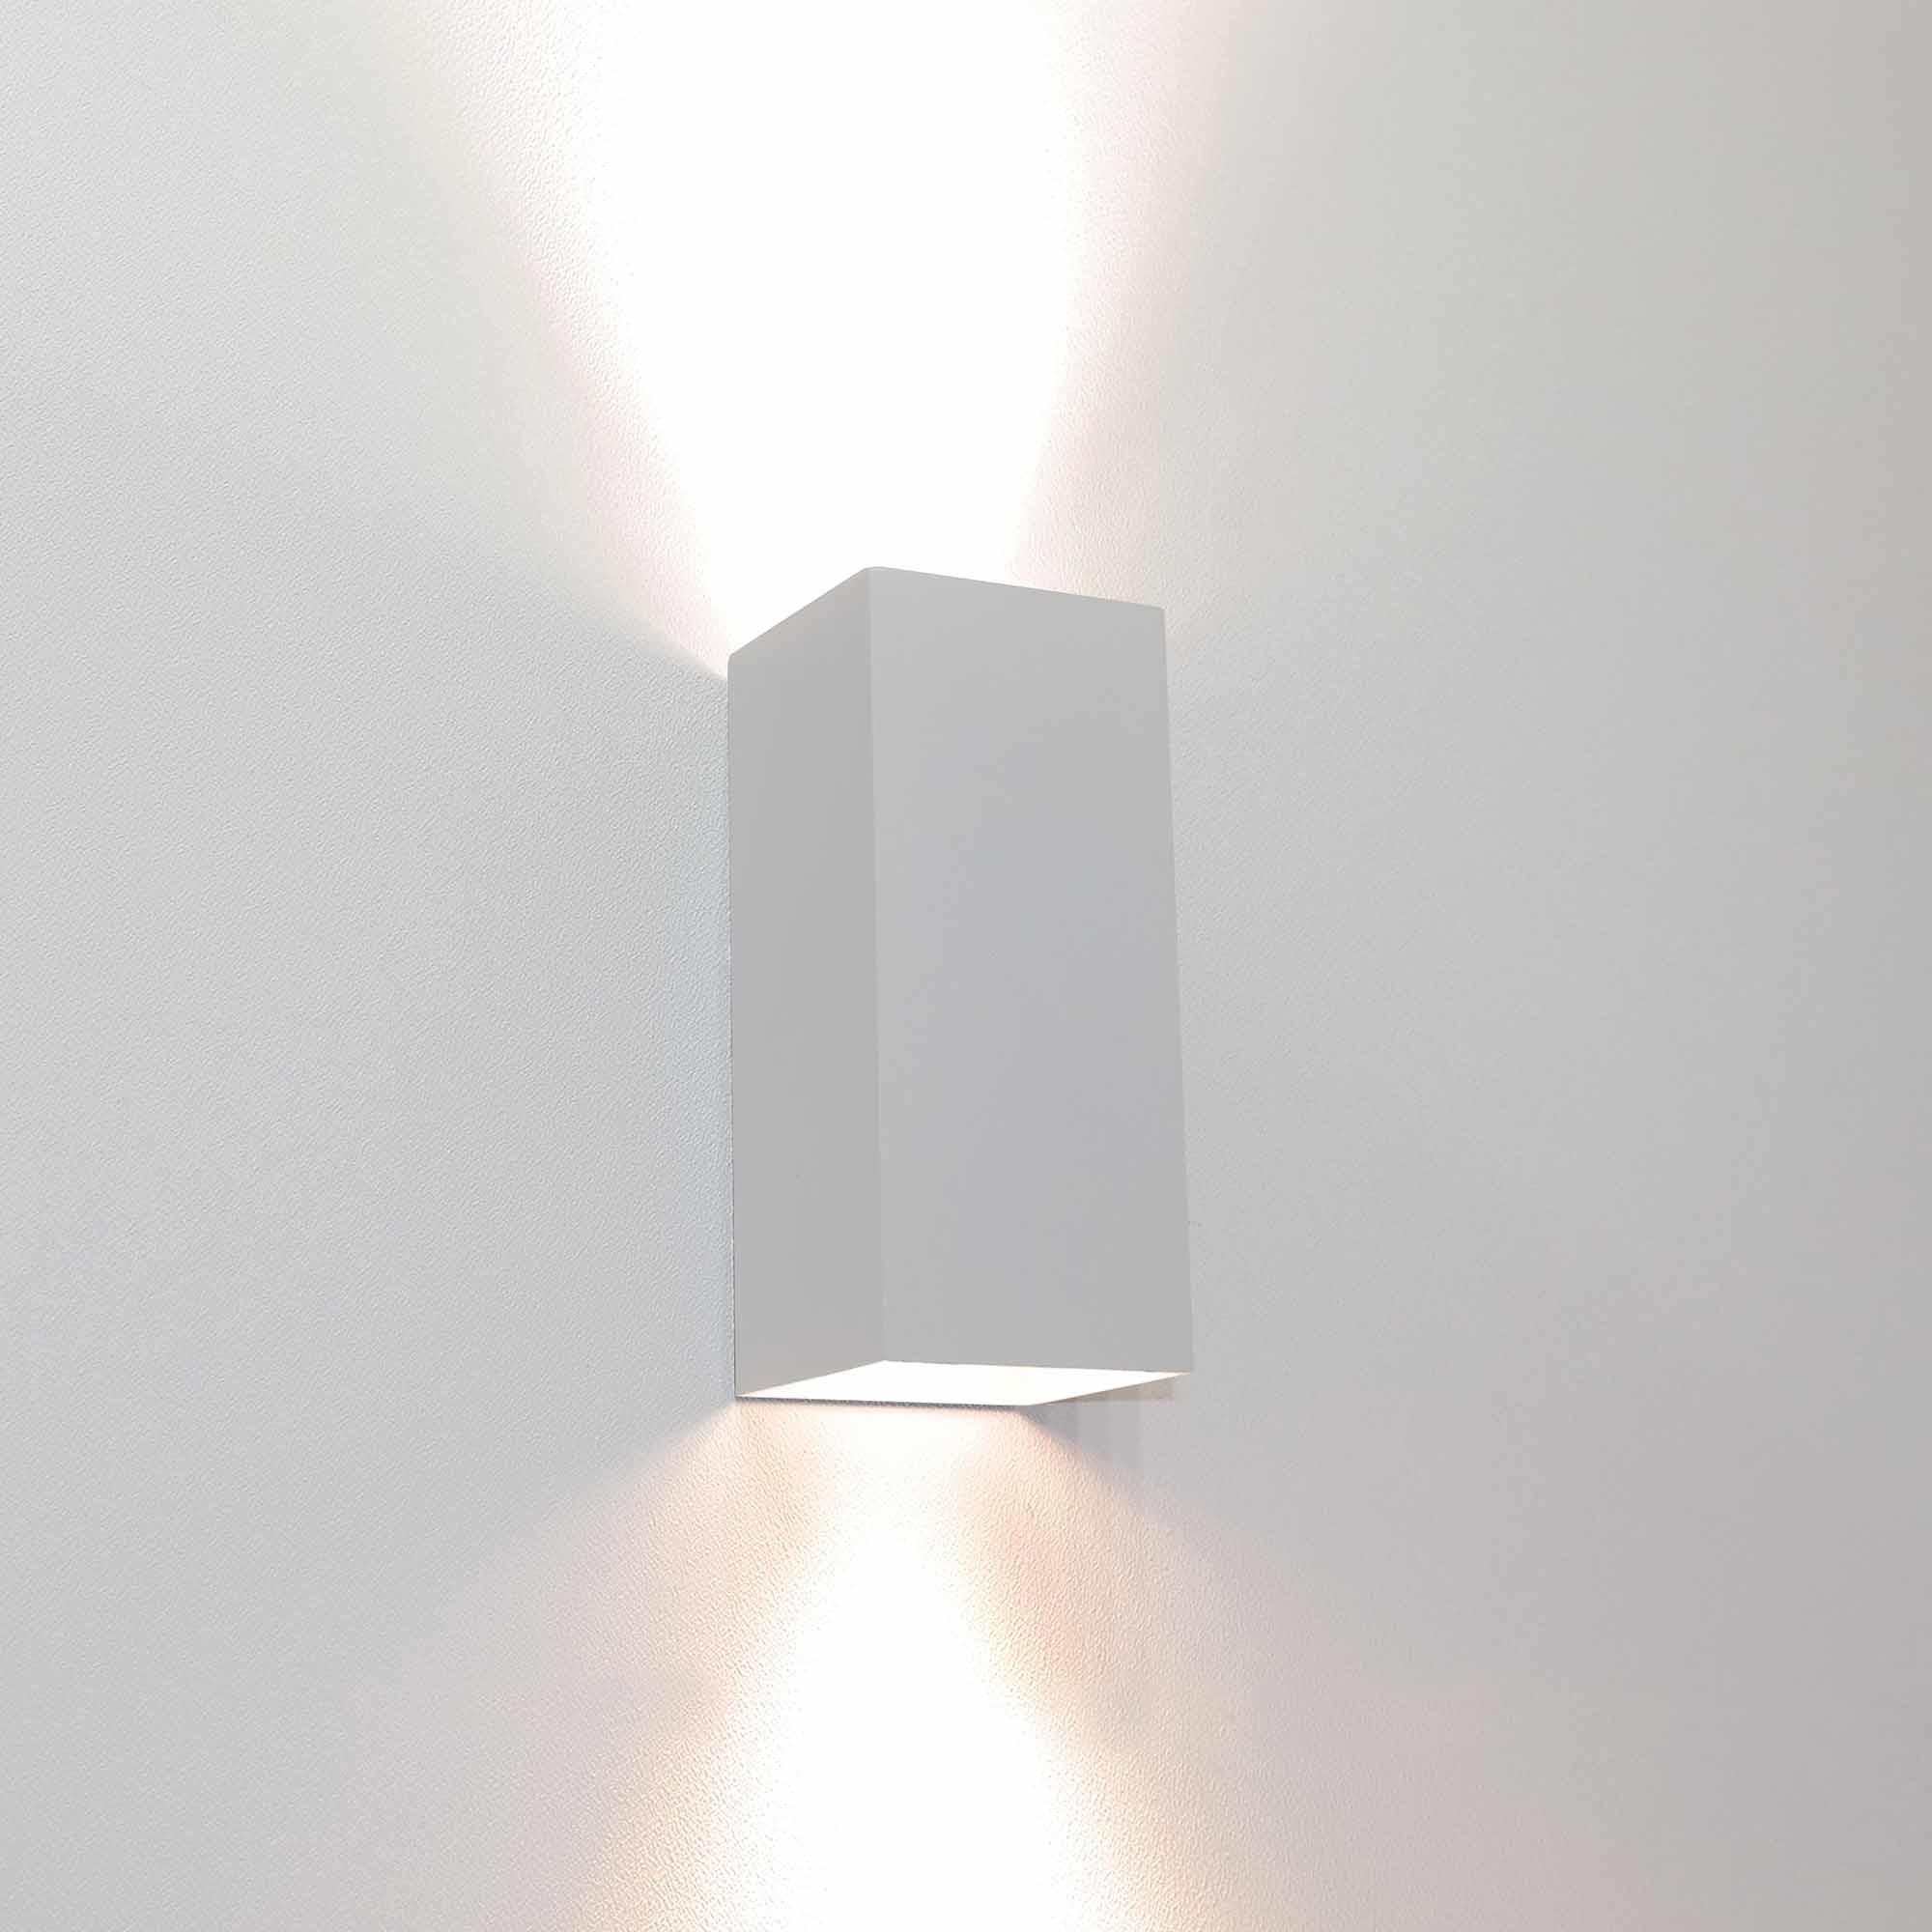 Artdelight Wandlamp Dante 2 lichts 15,5 x 6,5 cm wit